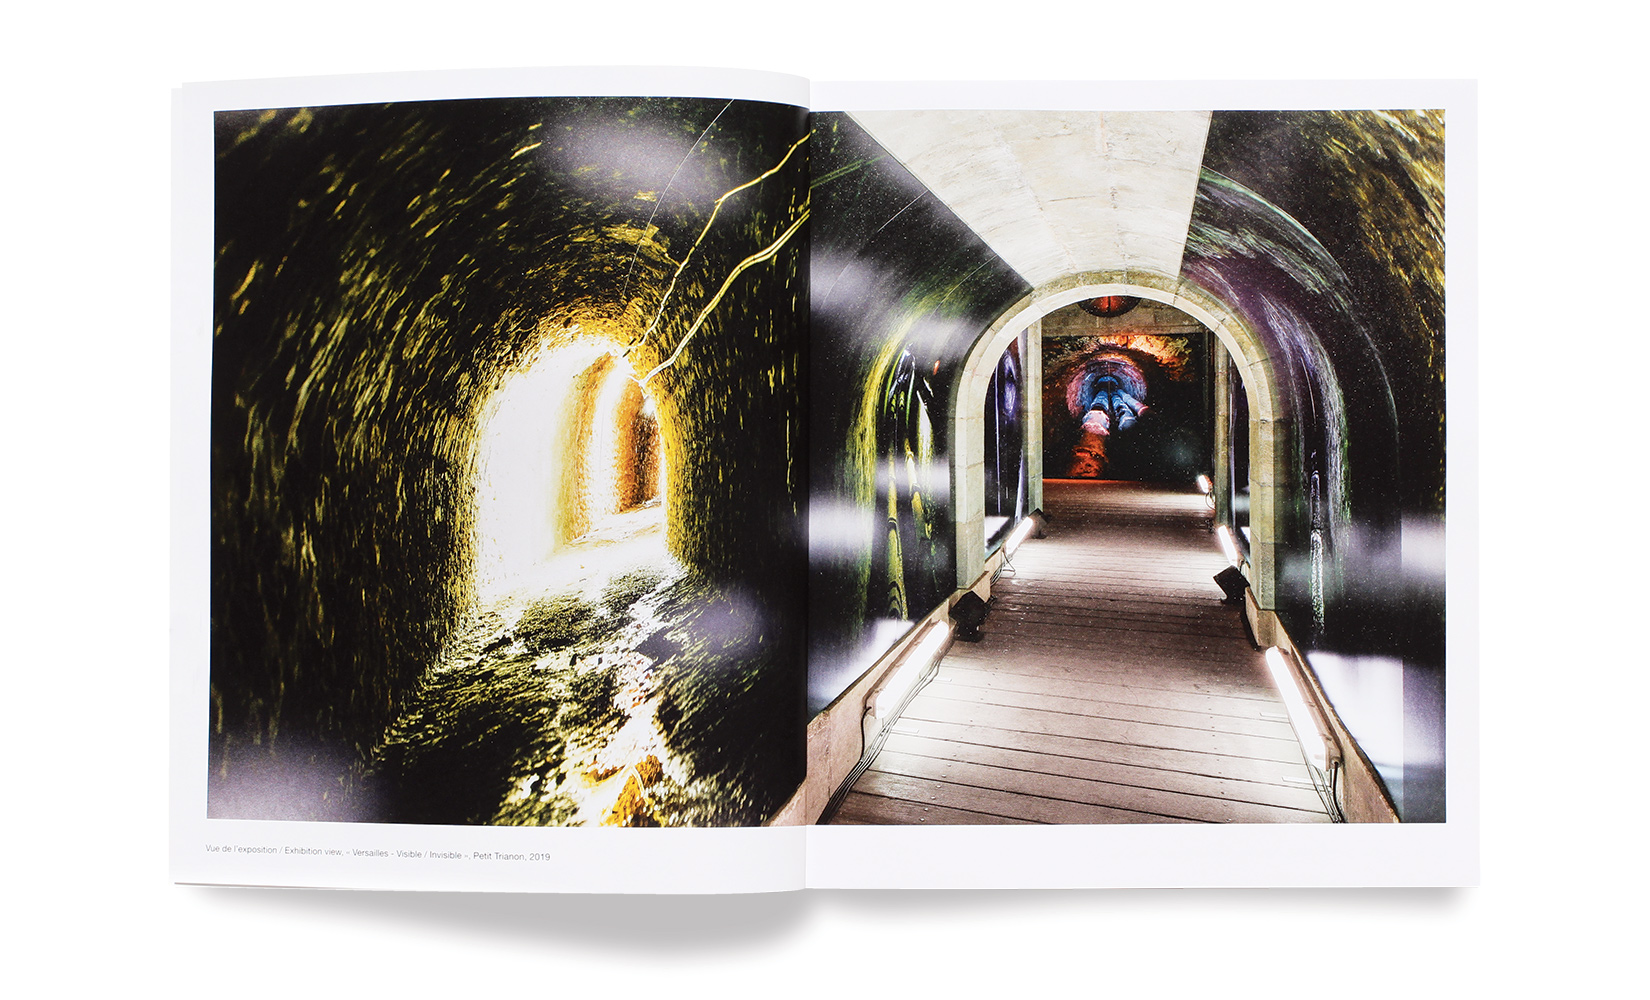 versailles-visible-invisible-toluca-studio-olivier-andreotti-NAN-GOLDIN-2.jpg